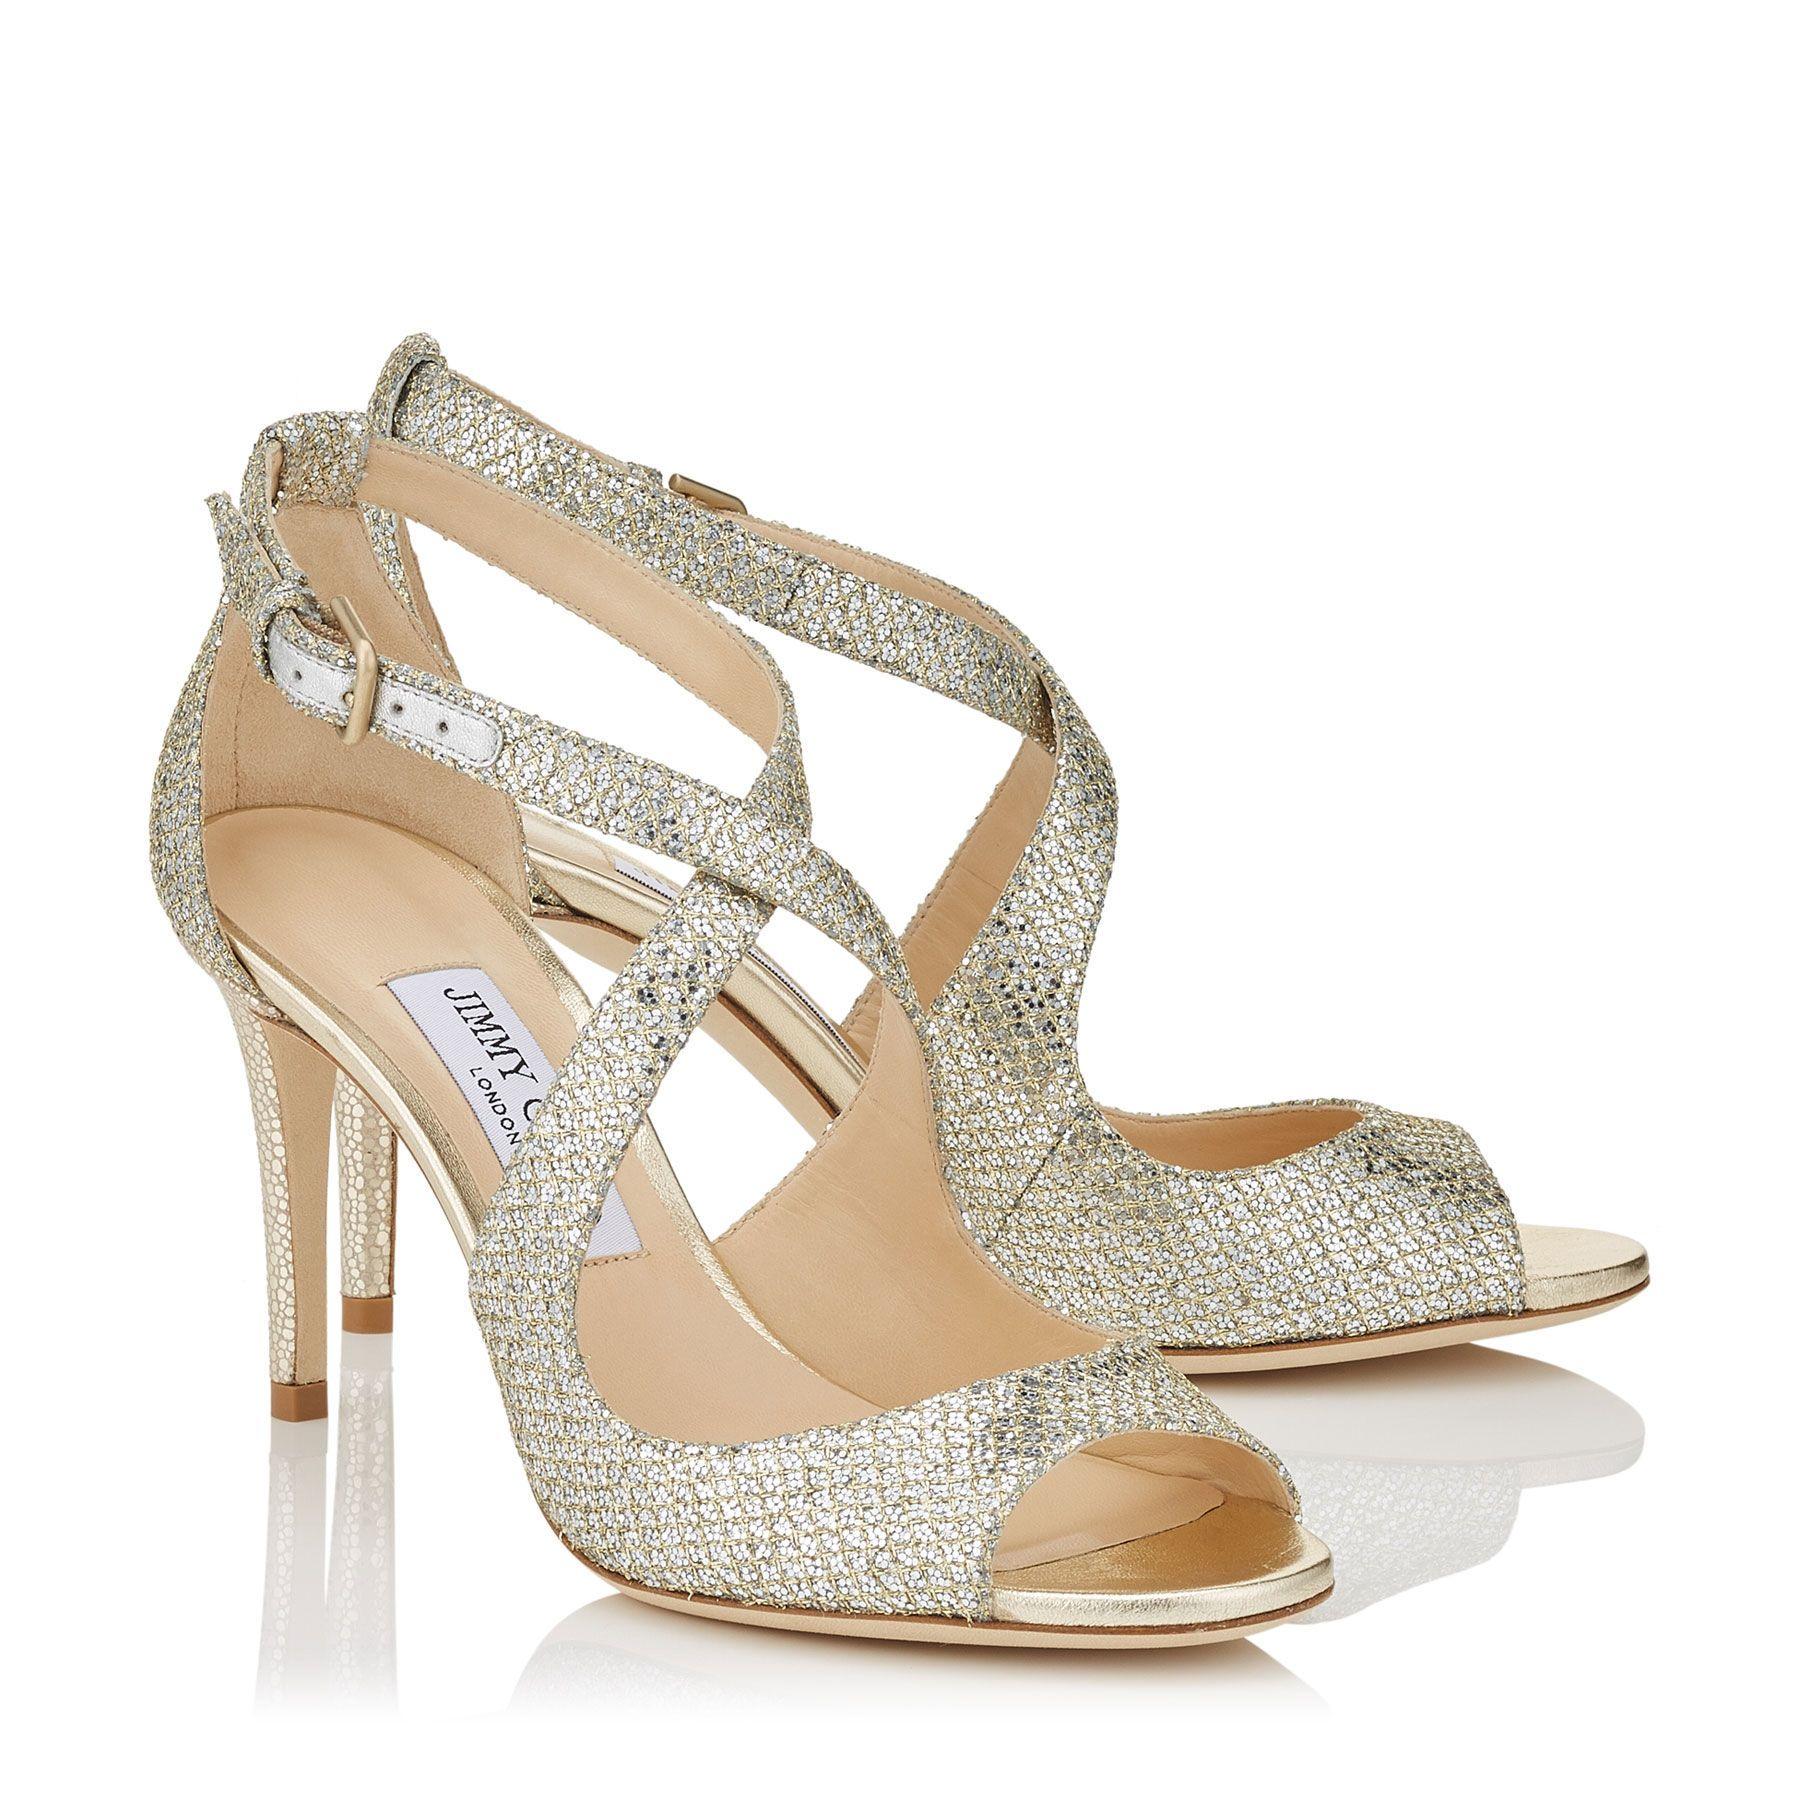 EMILY 85 550€ wishlist schoenen Pinterest